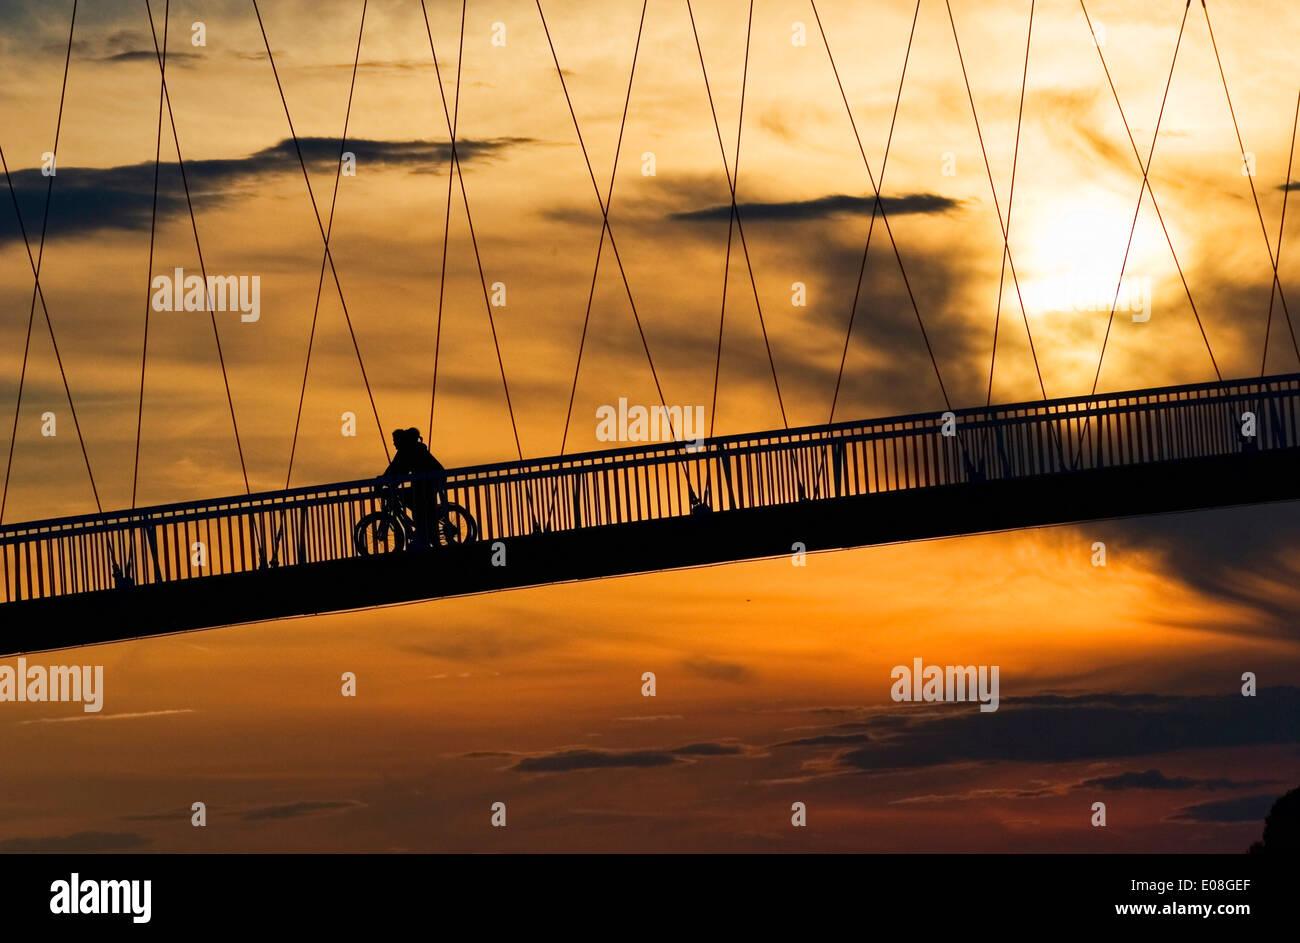 Pedestrian footbridge over Drava river at sunset, Osijek, Croatia - Stock Image